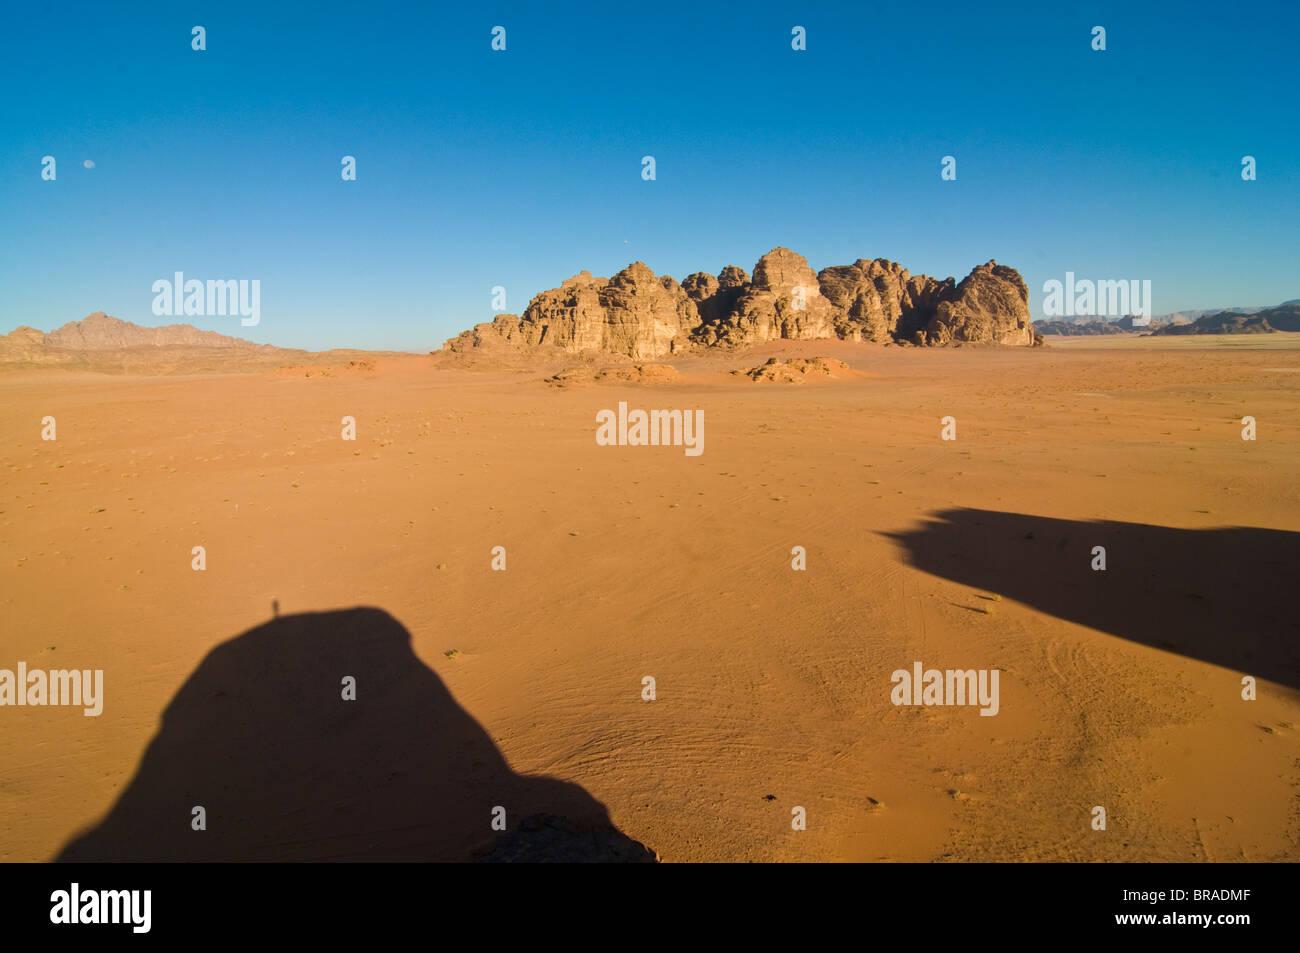 The stunning desert scenery of Wadi Rum, Jordan, Middle East Stock Photo